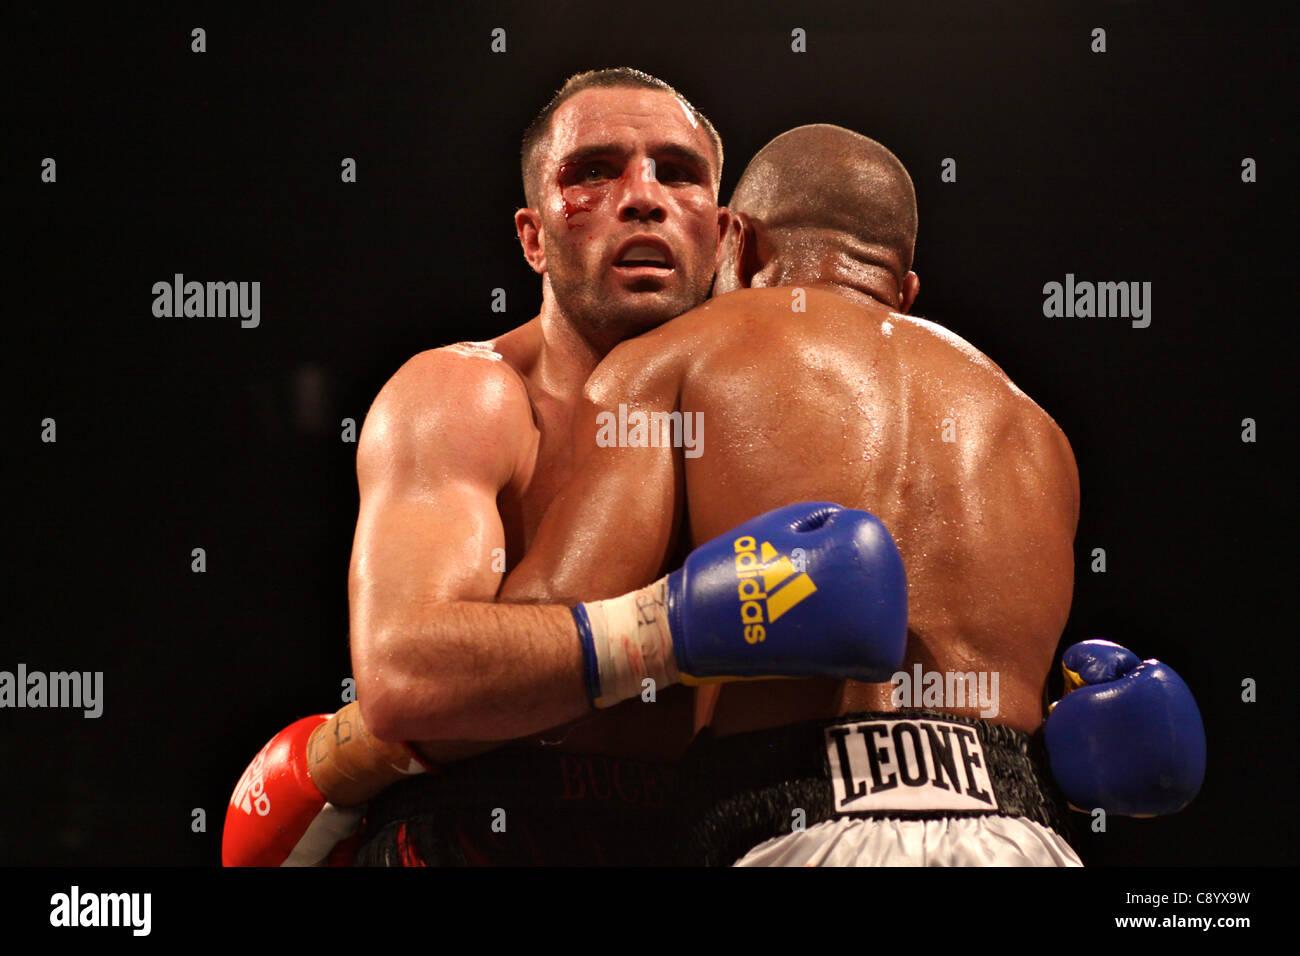 FLORENCE (IT), 04/Nov/2011: Bundu VS Petrucci, Welter Weight Boxing European Title @ Mandela Forum - - Stock Image